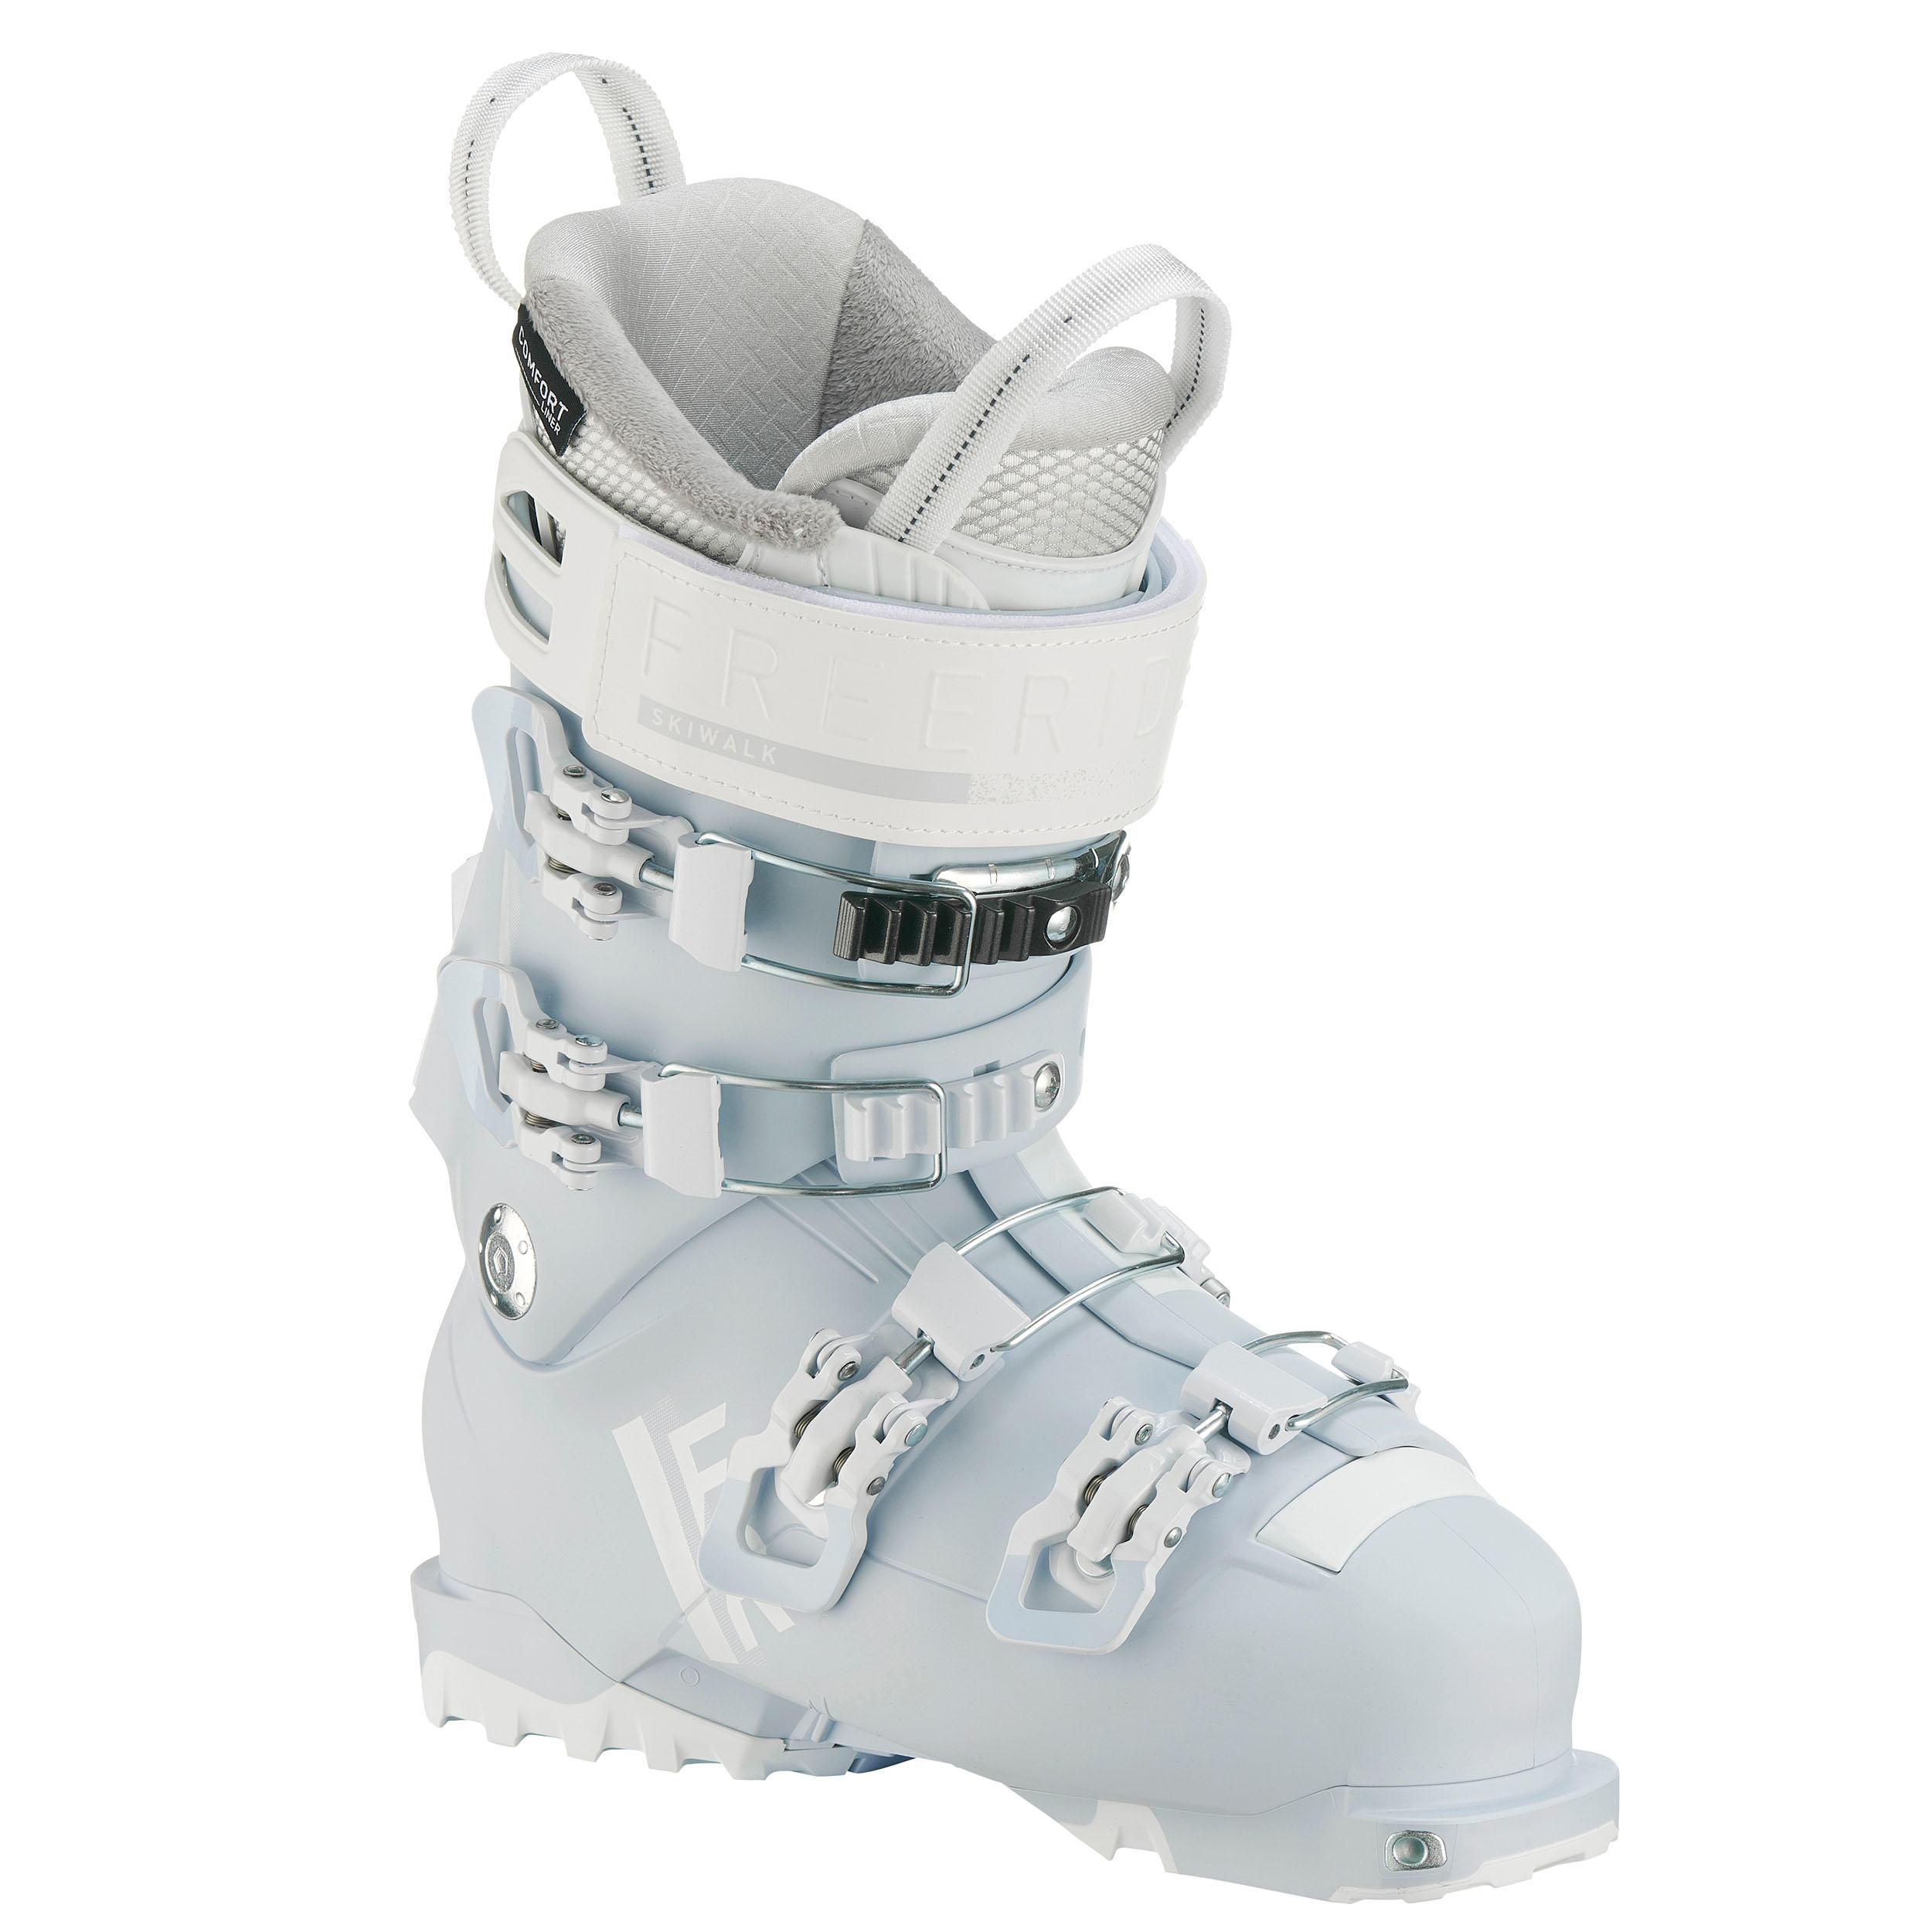 Clăpari schi FR 900 FLEX 100 imagine